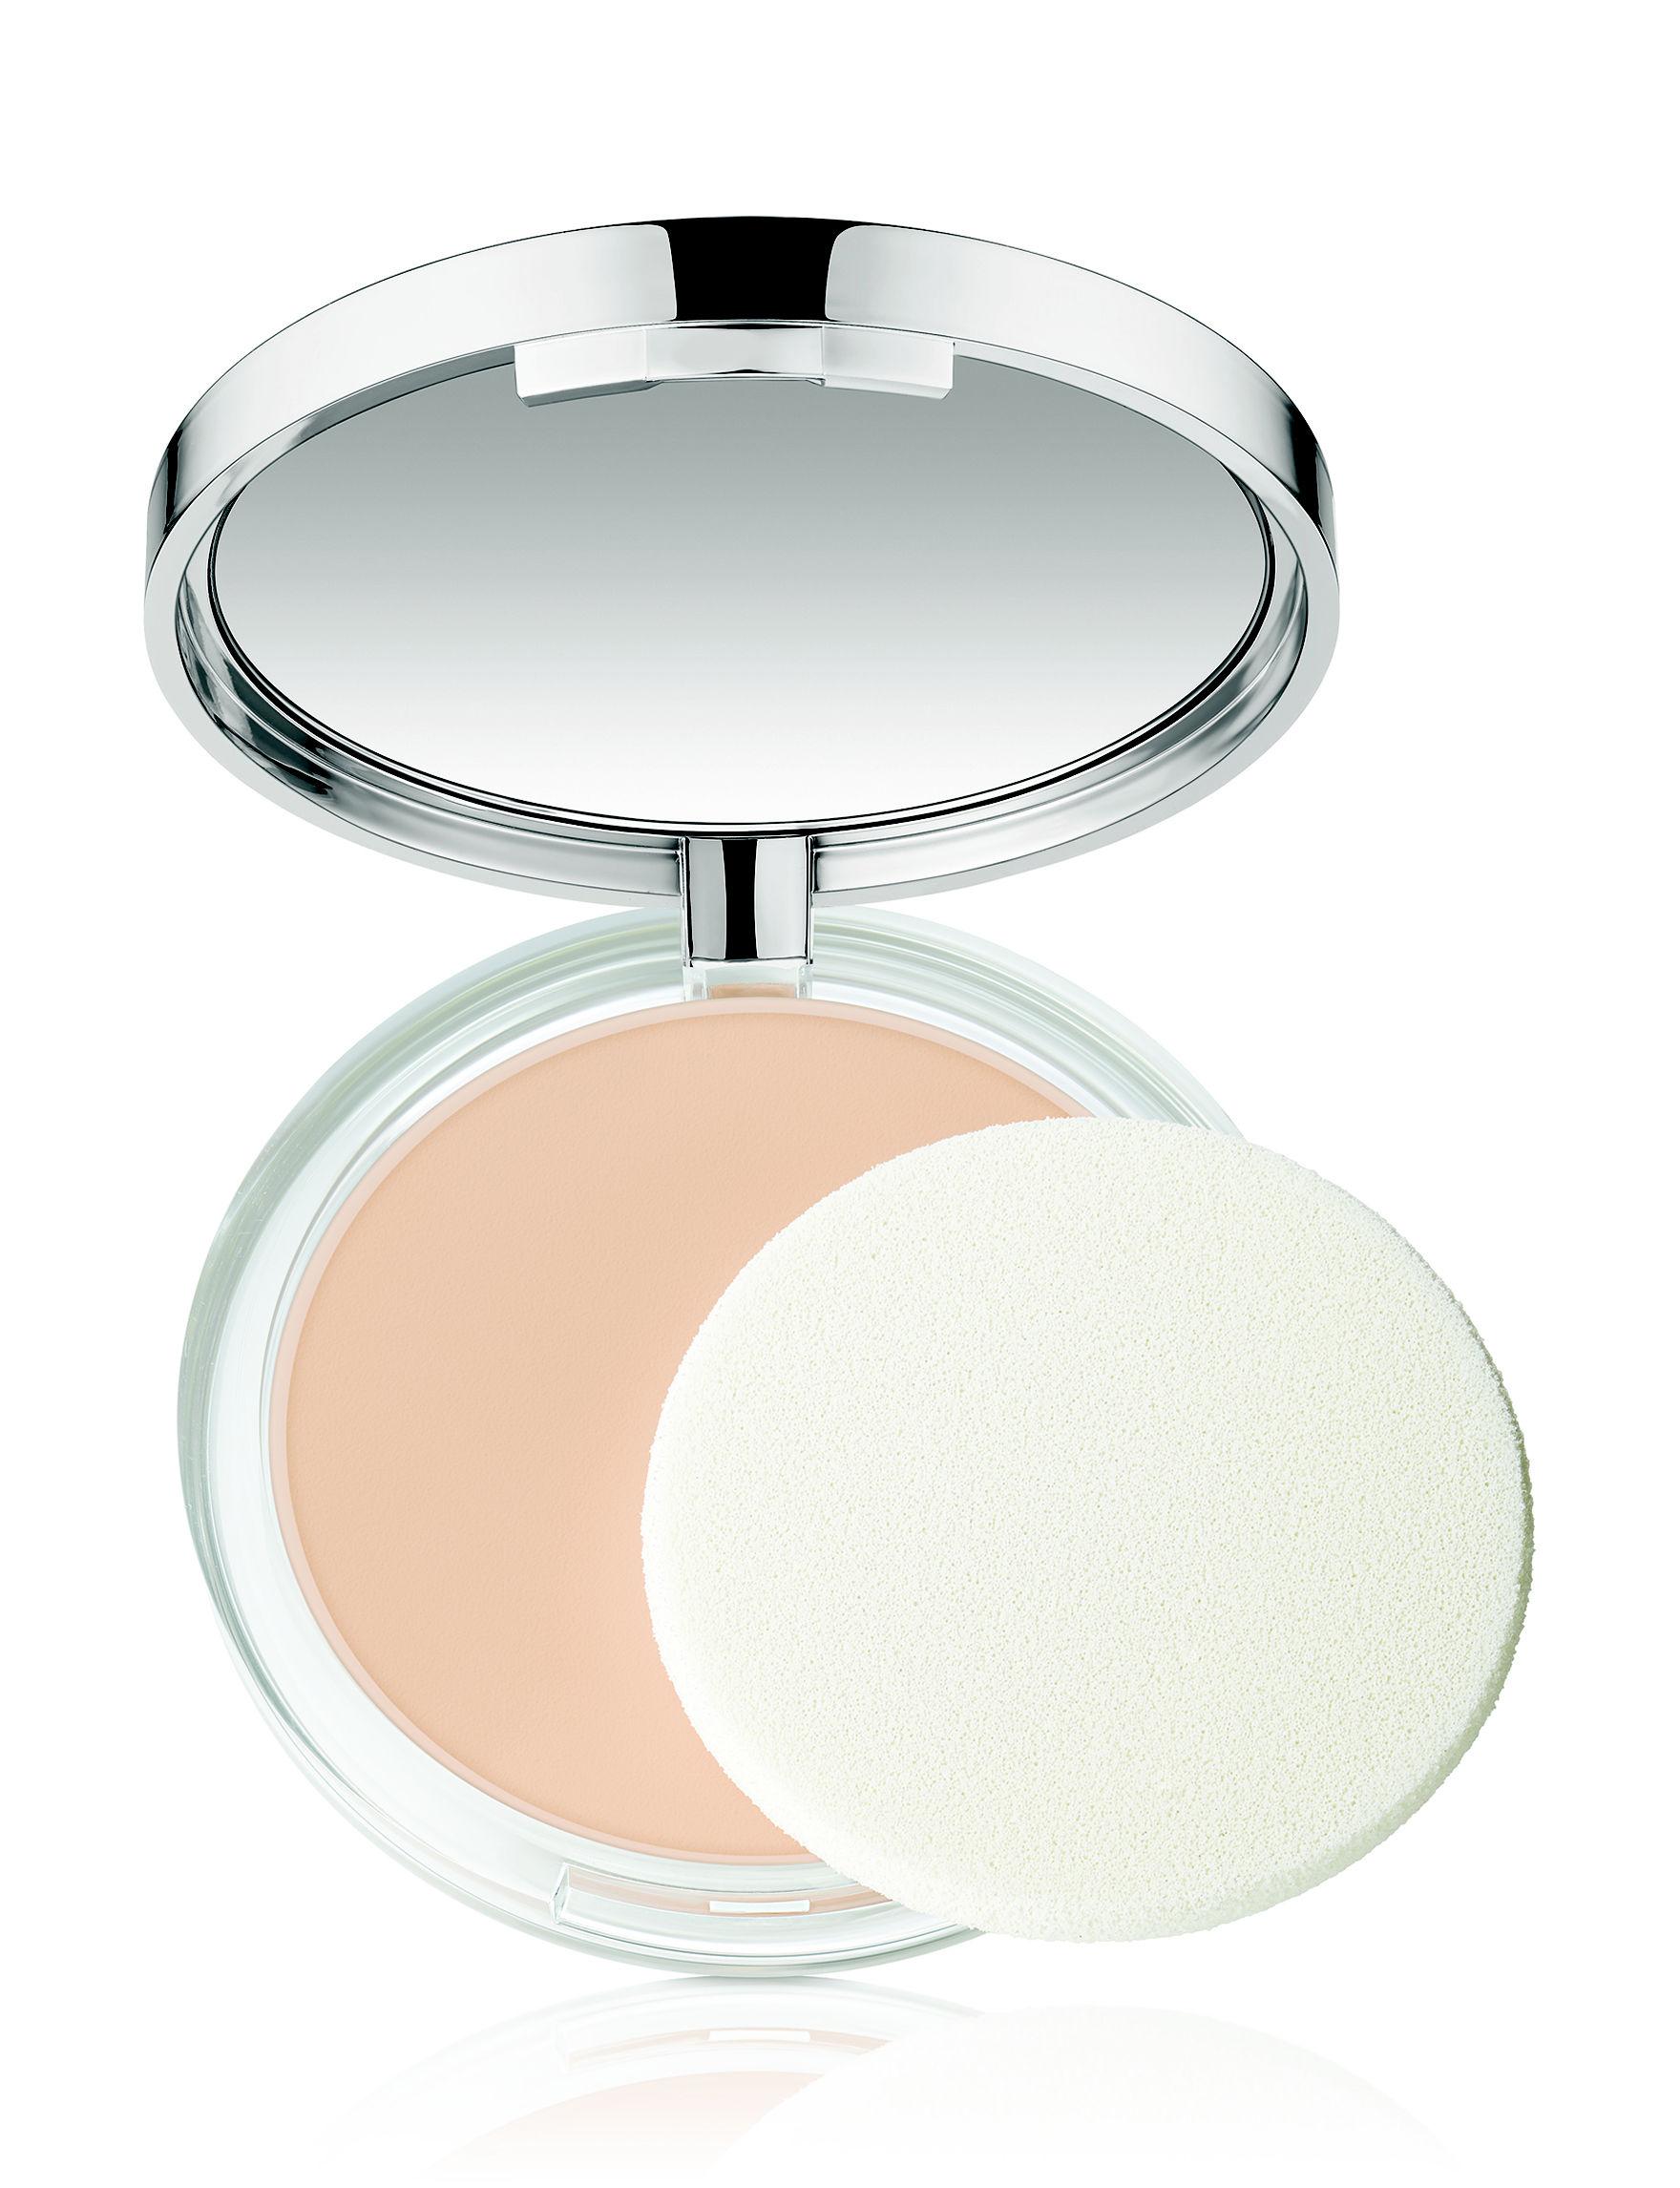 Clinique CL - Fair Face Foundation Powder